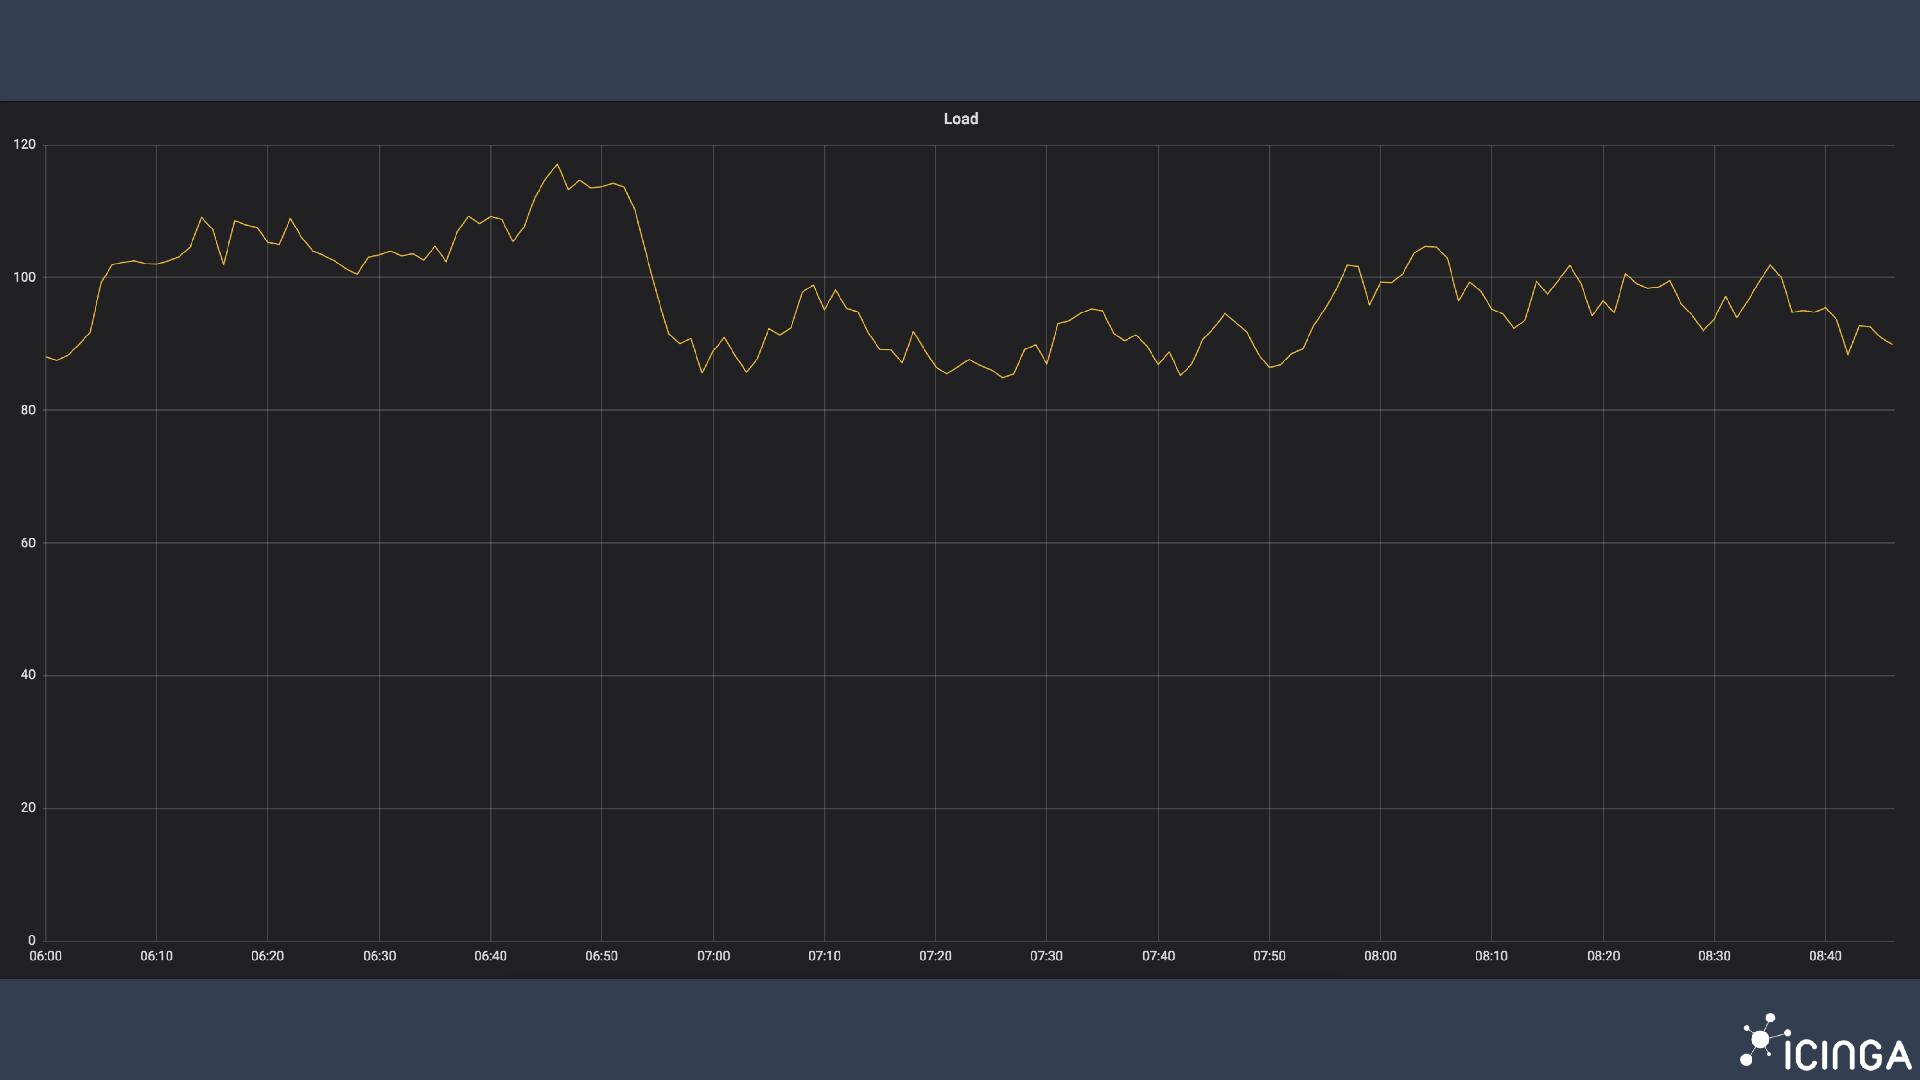 Load Graph 2